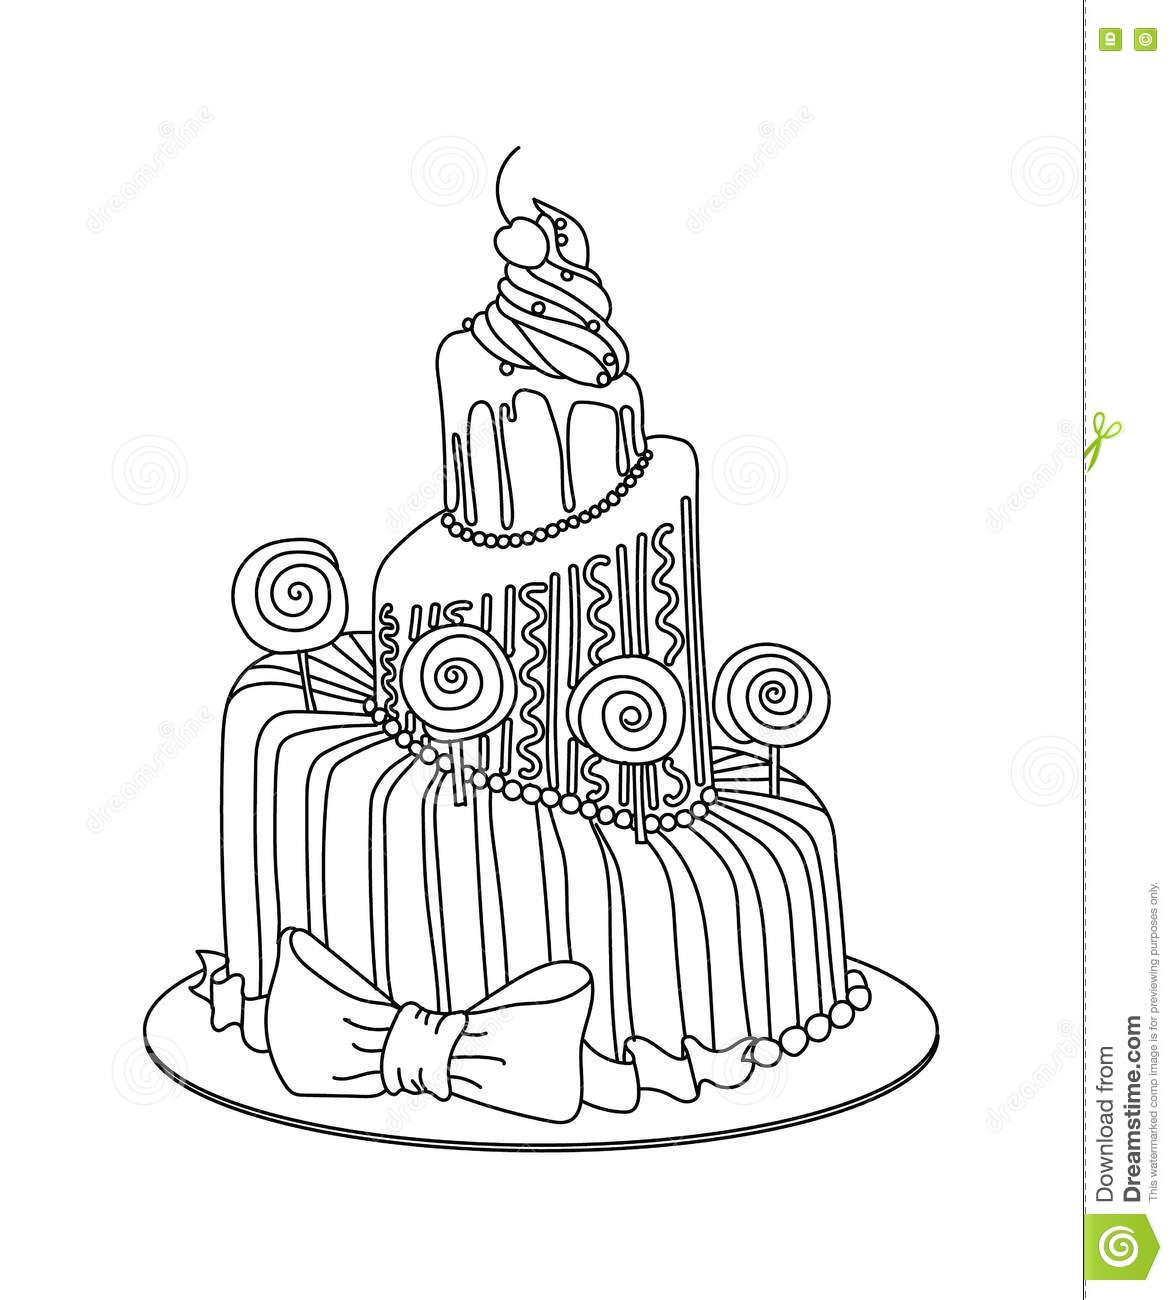 1173x1300 Drawn Cake Sketched